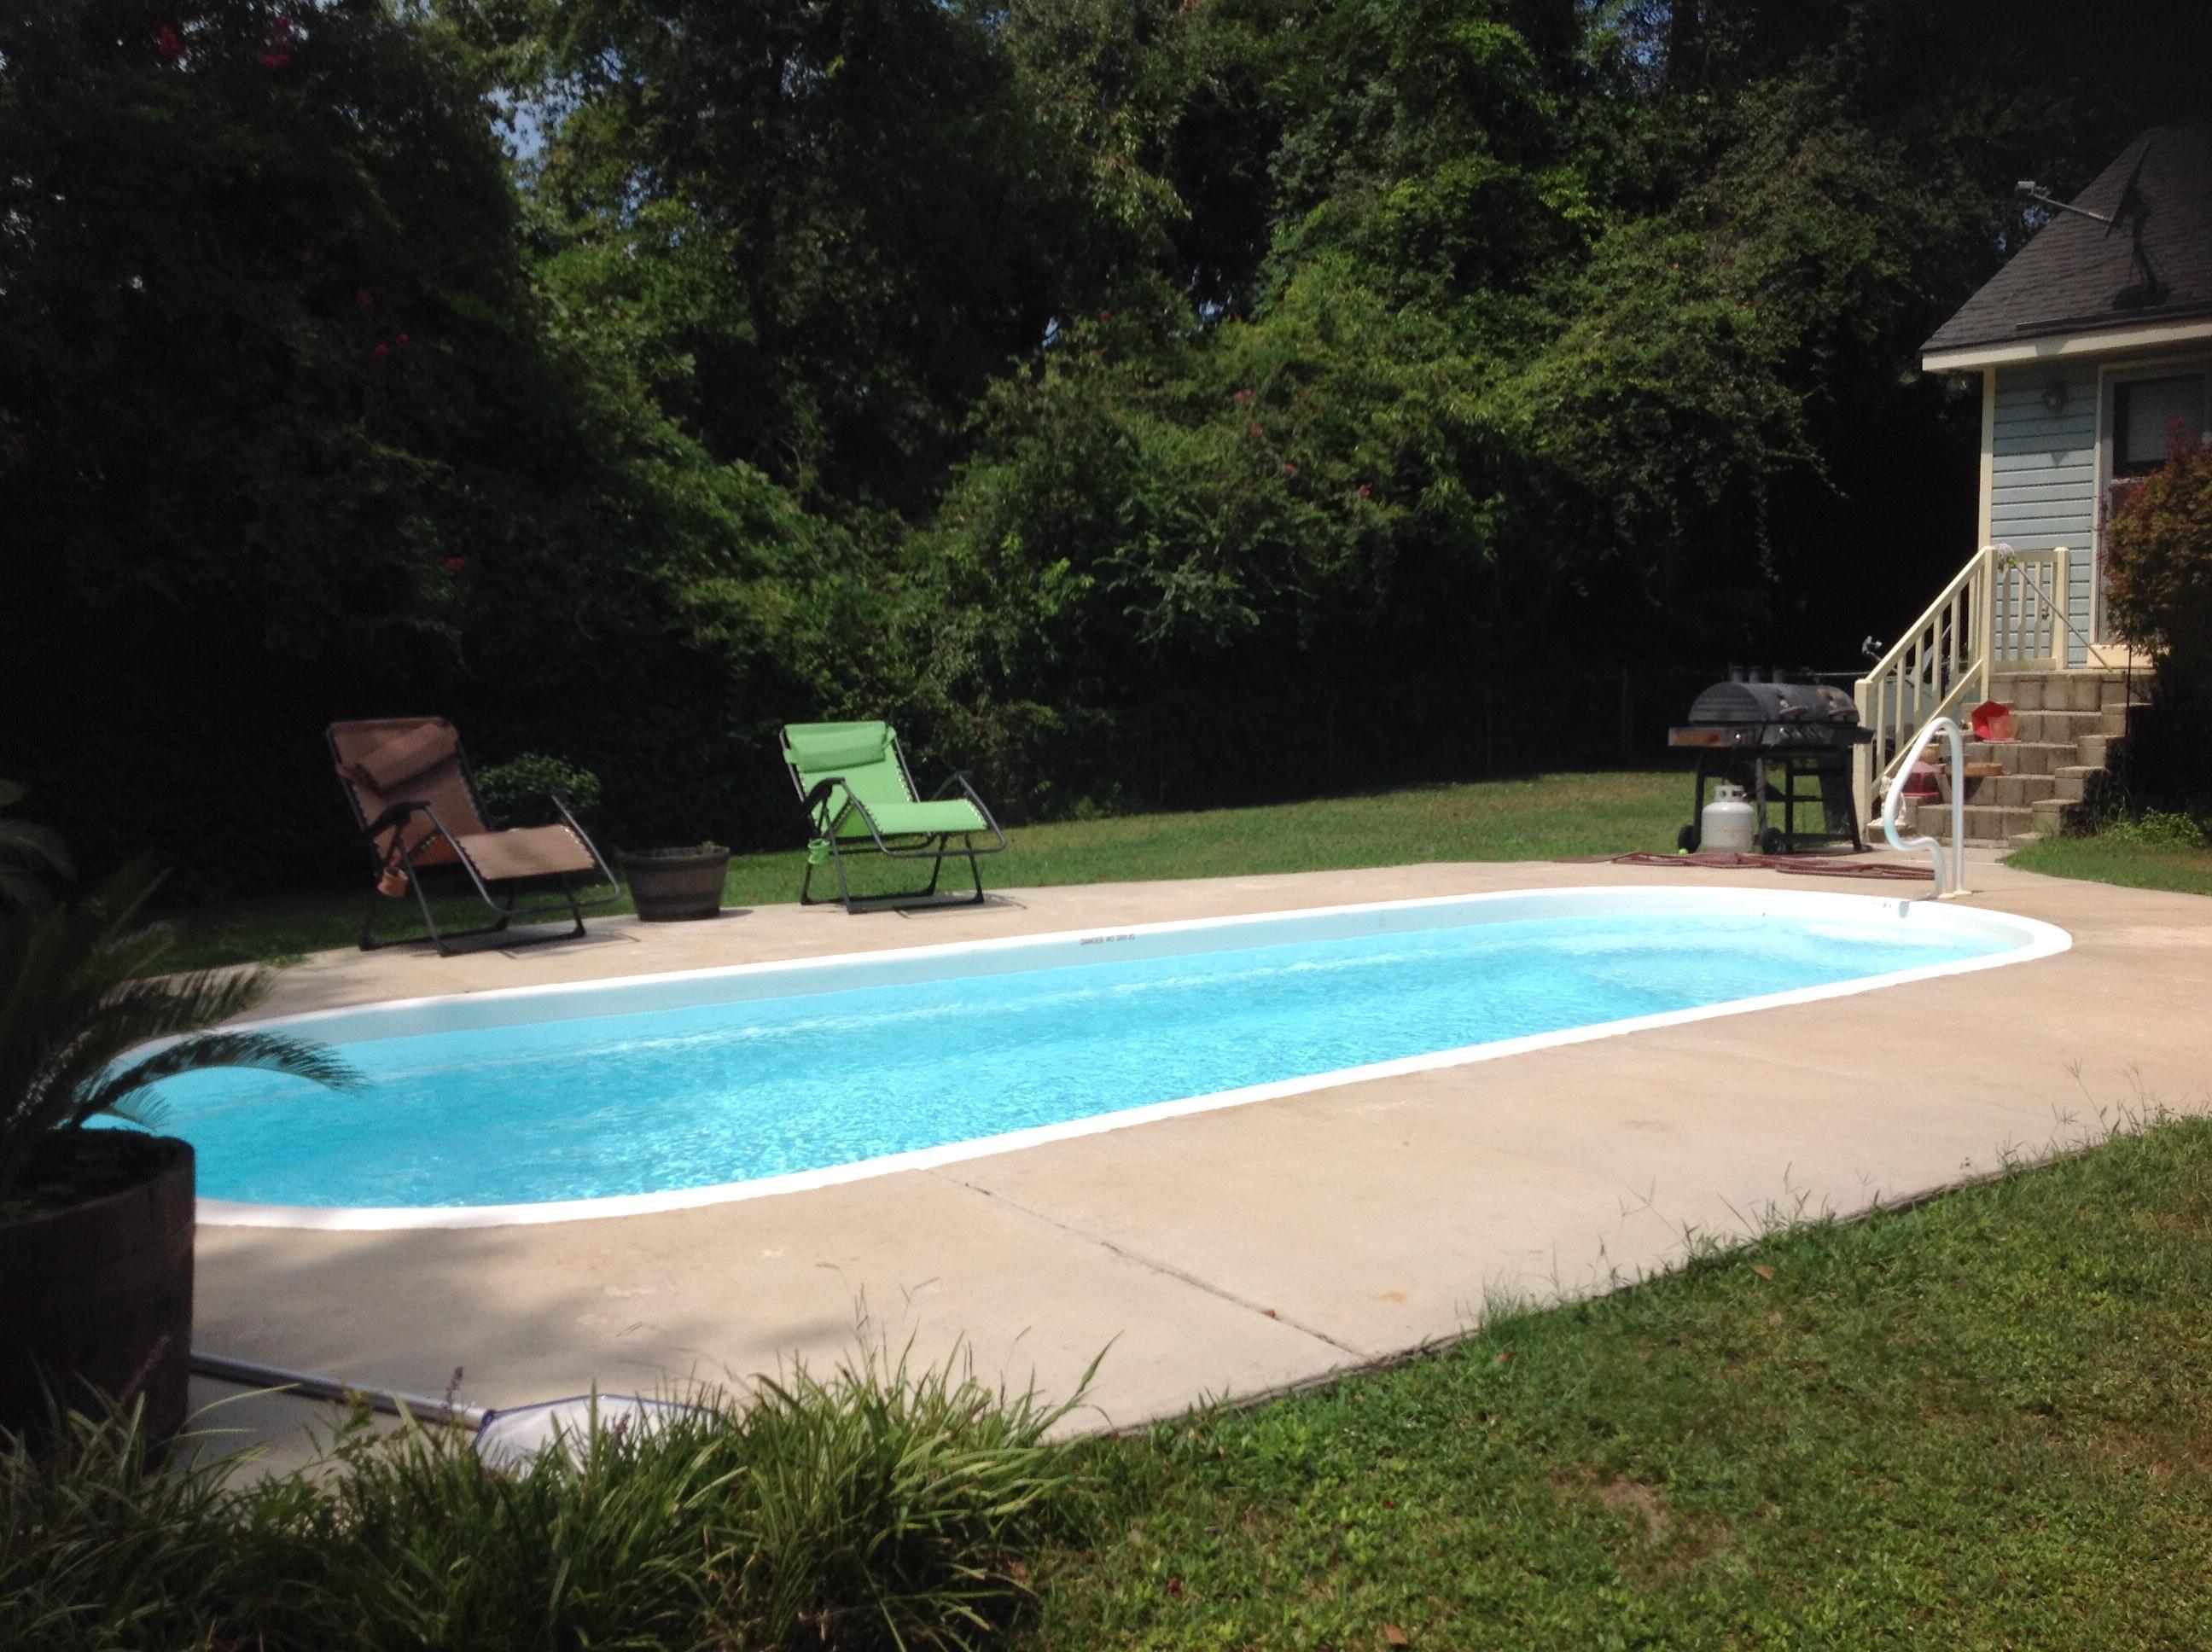 Belvedere II Homes For Sale - 122 Dogwood, Eutawville, SC - 36